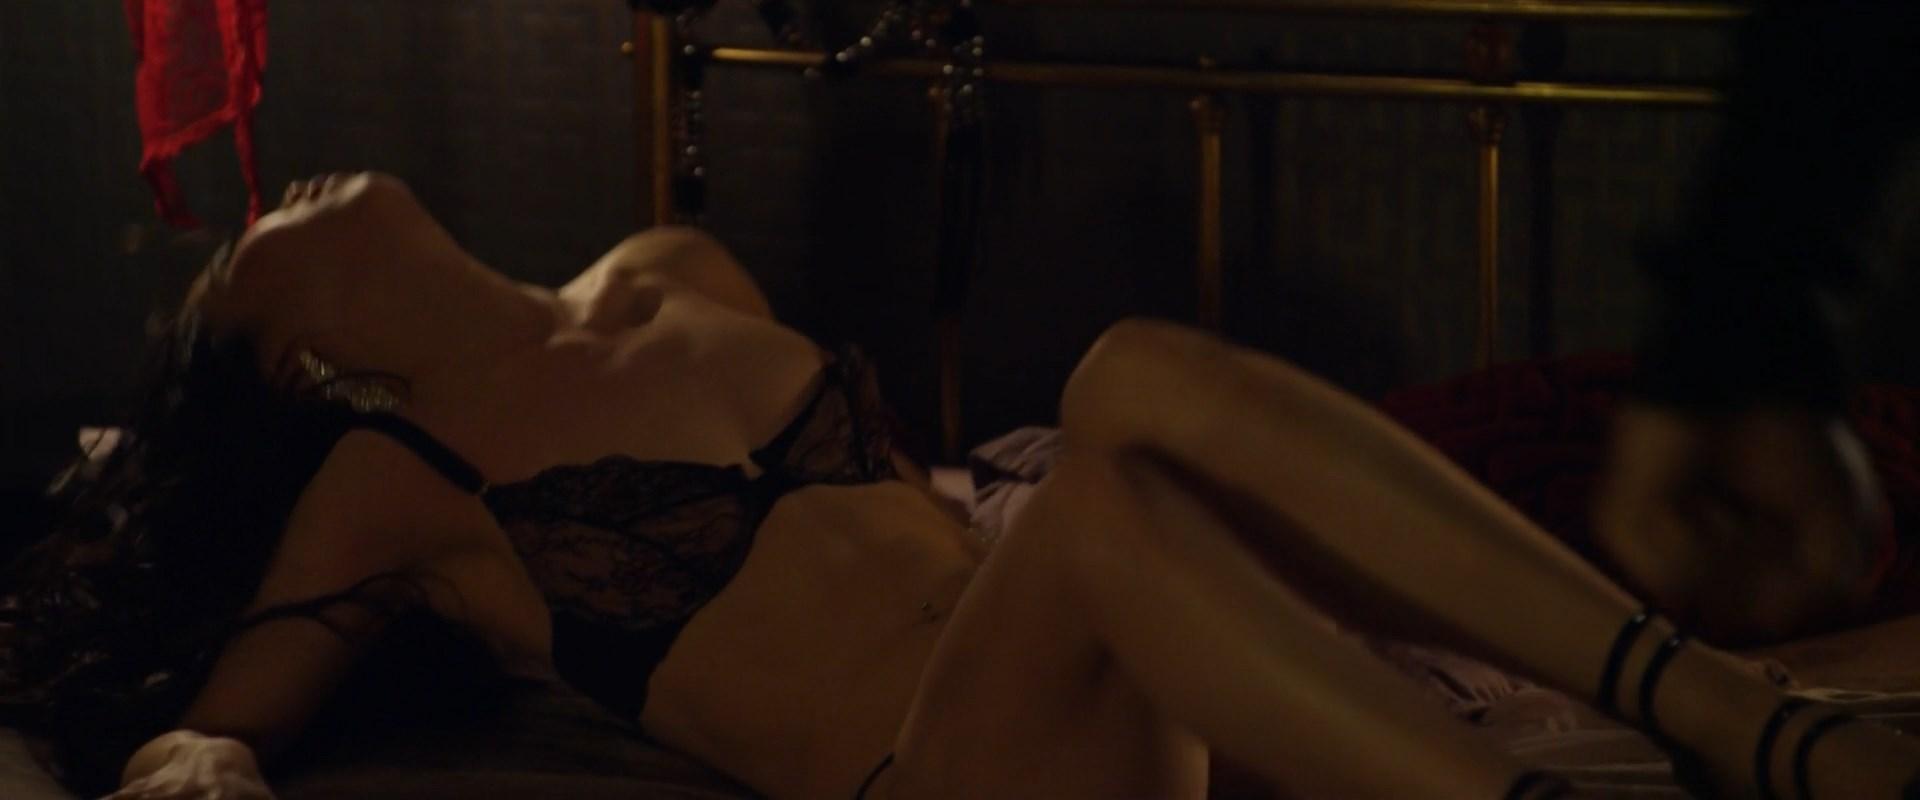 Boobs Linda Van Dyck Nude Pics